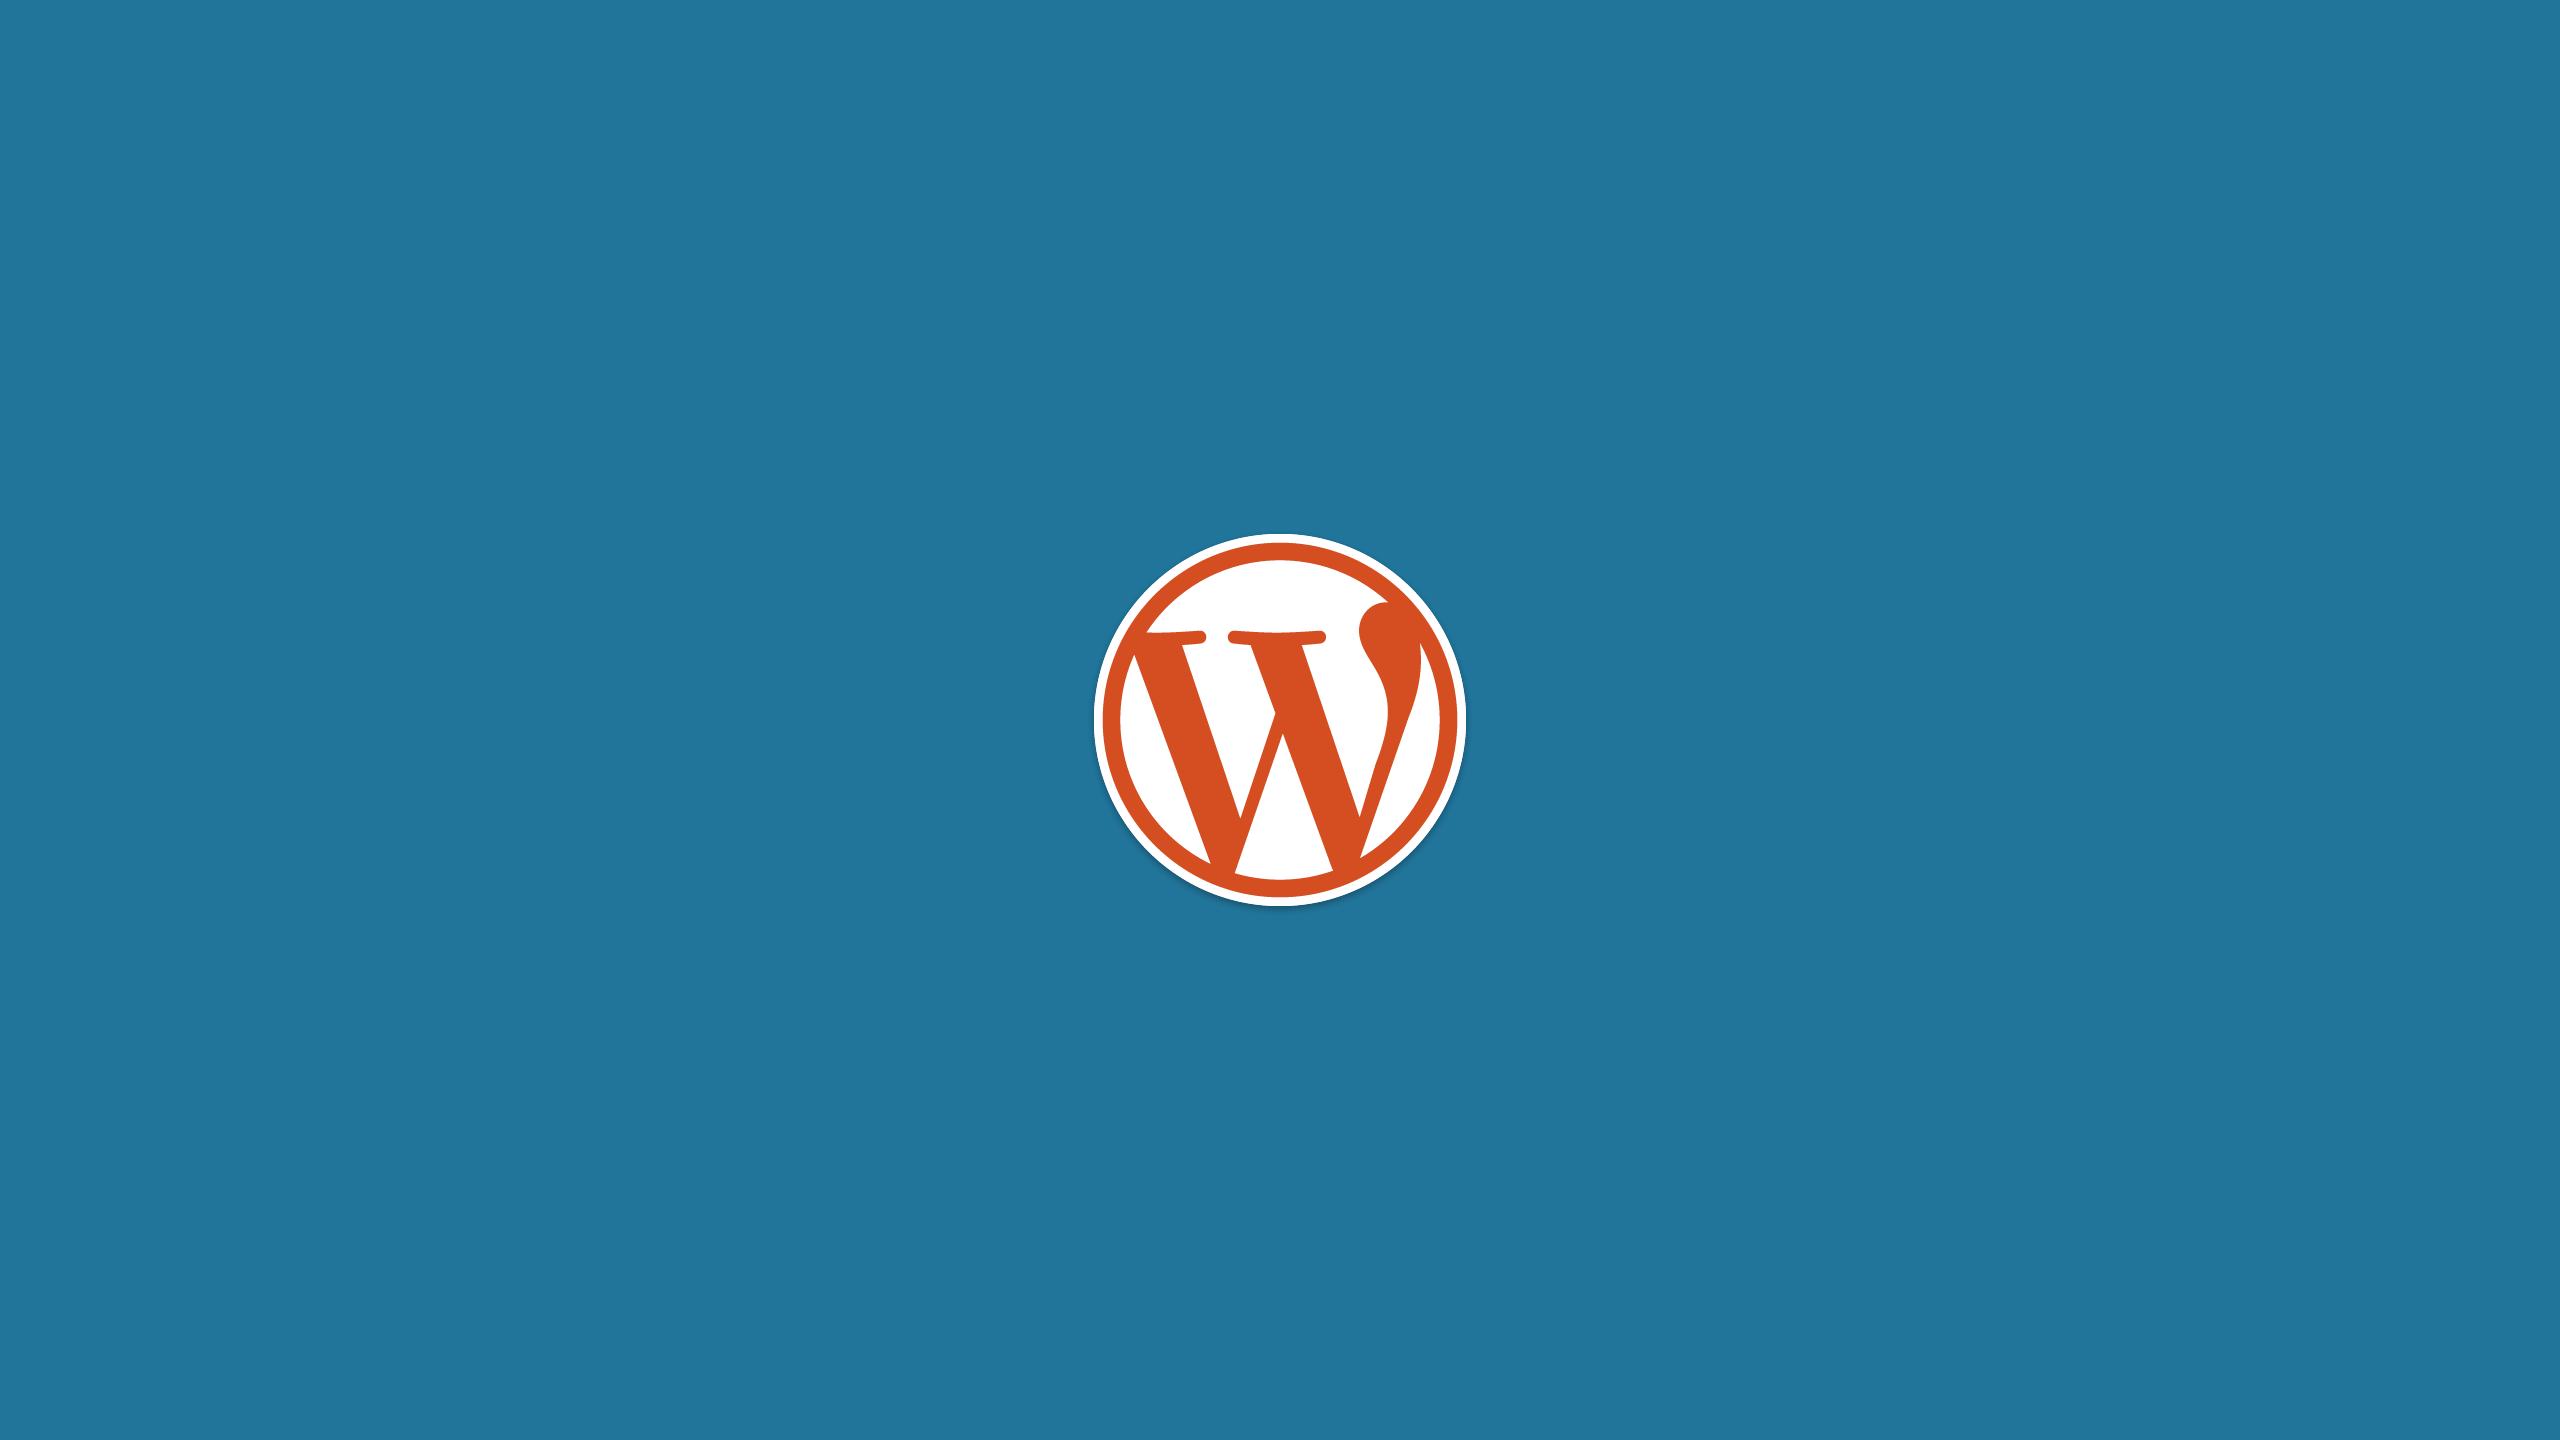 About logos and graphics wordpress 25601400 buycottarizona